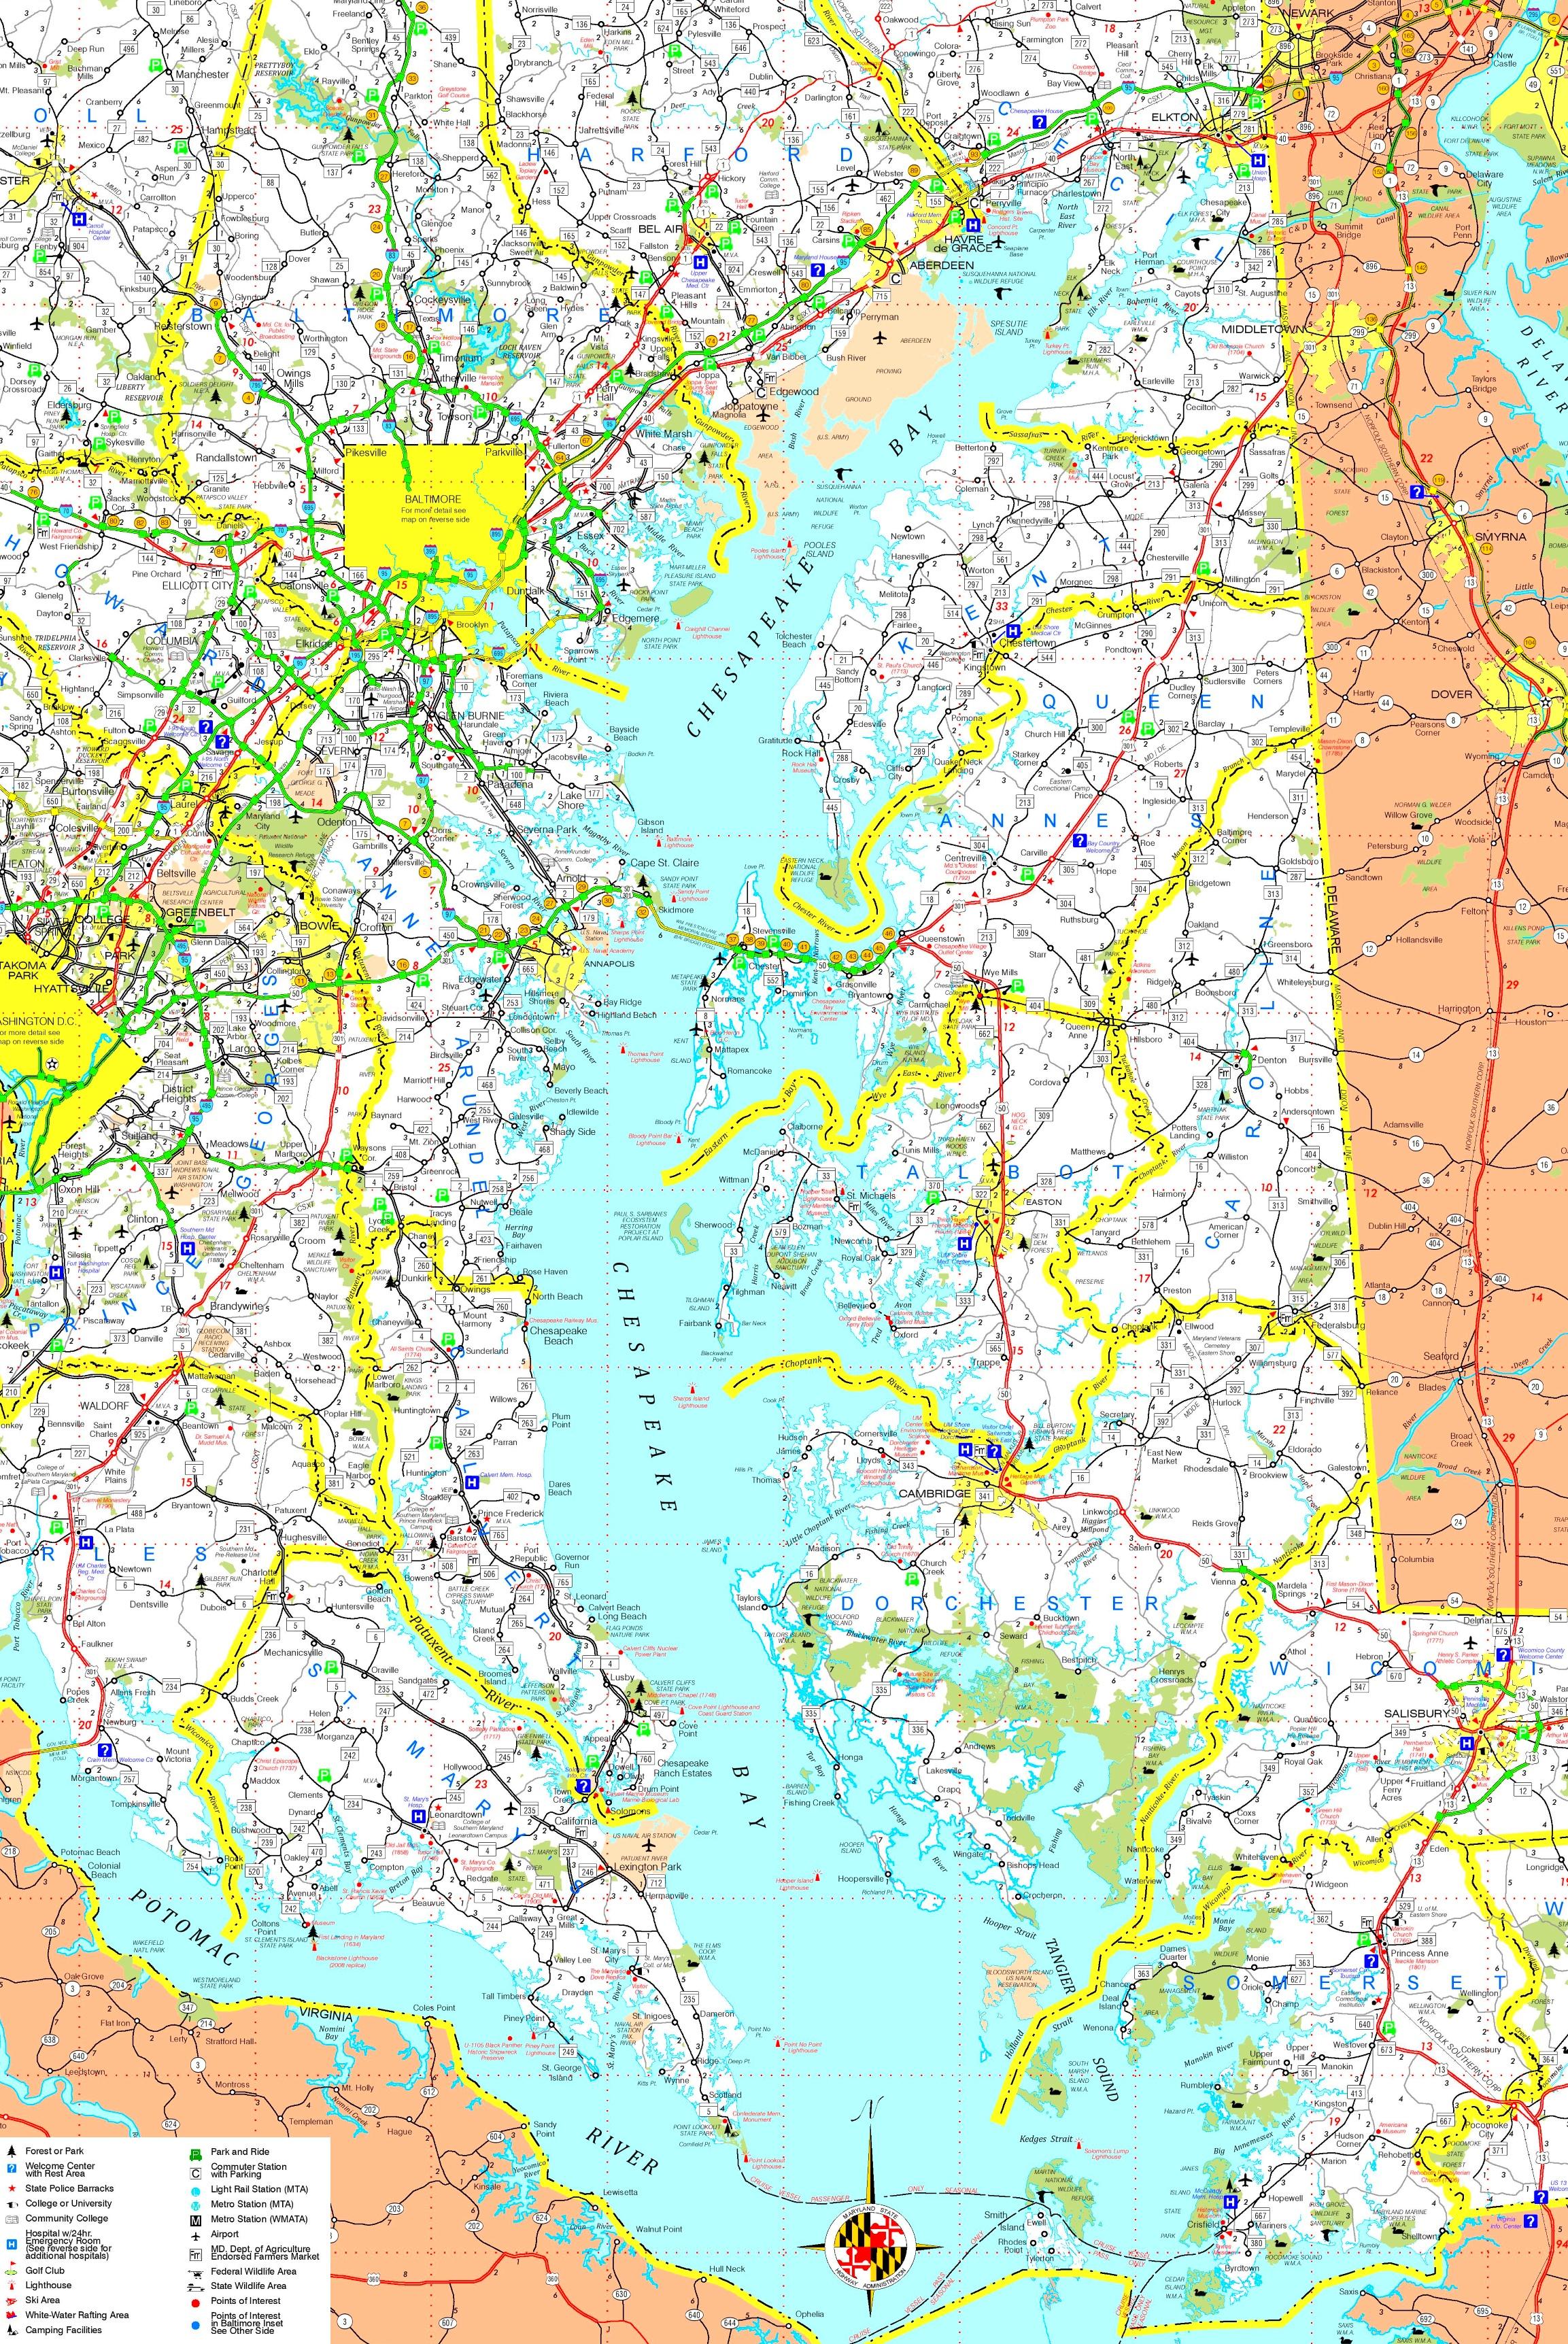 Large Detailed Map Of Chesapeake Bay - Printable Map Of Chesapeake Bay